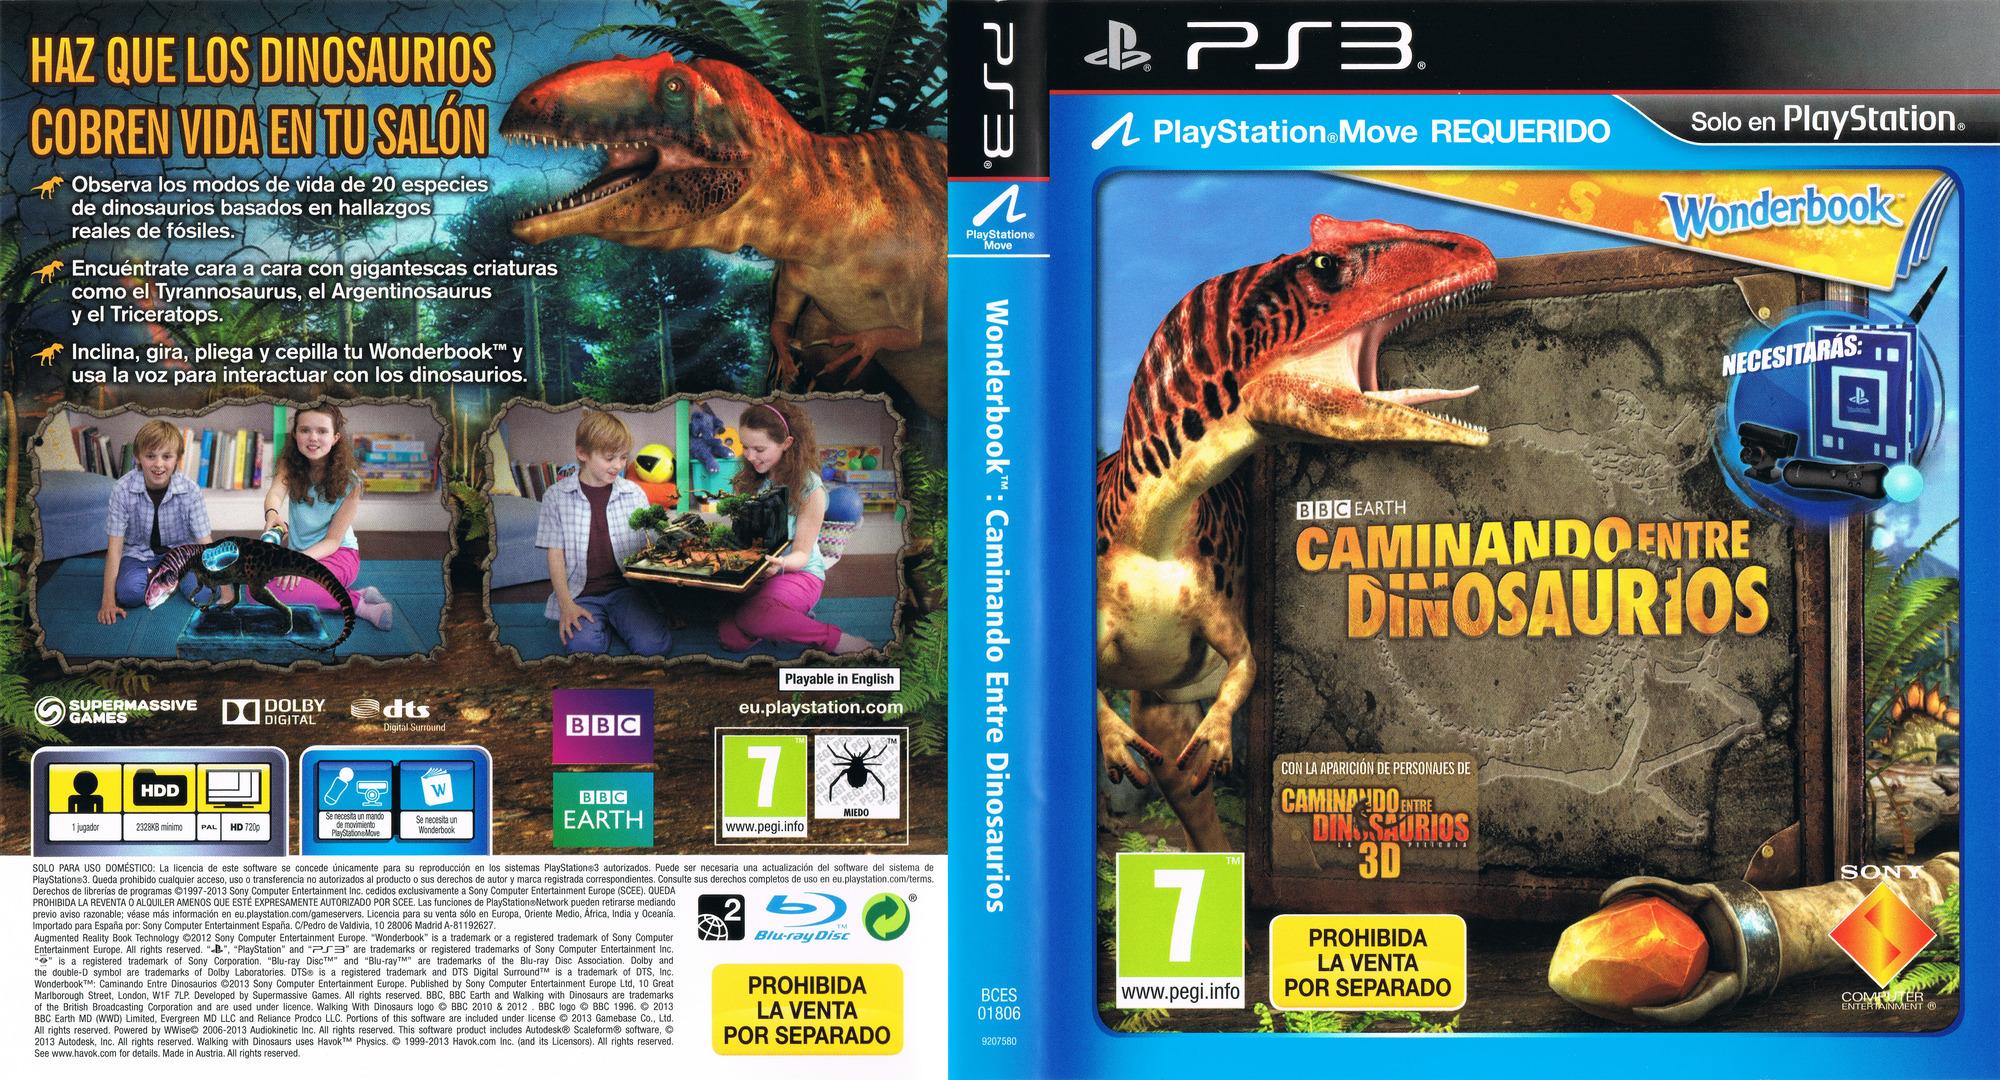 Wonderbook: Caminando entre Dinosaurios PS3 coverfullHQ (BCES01806)